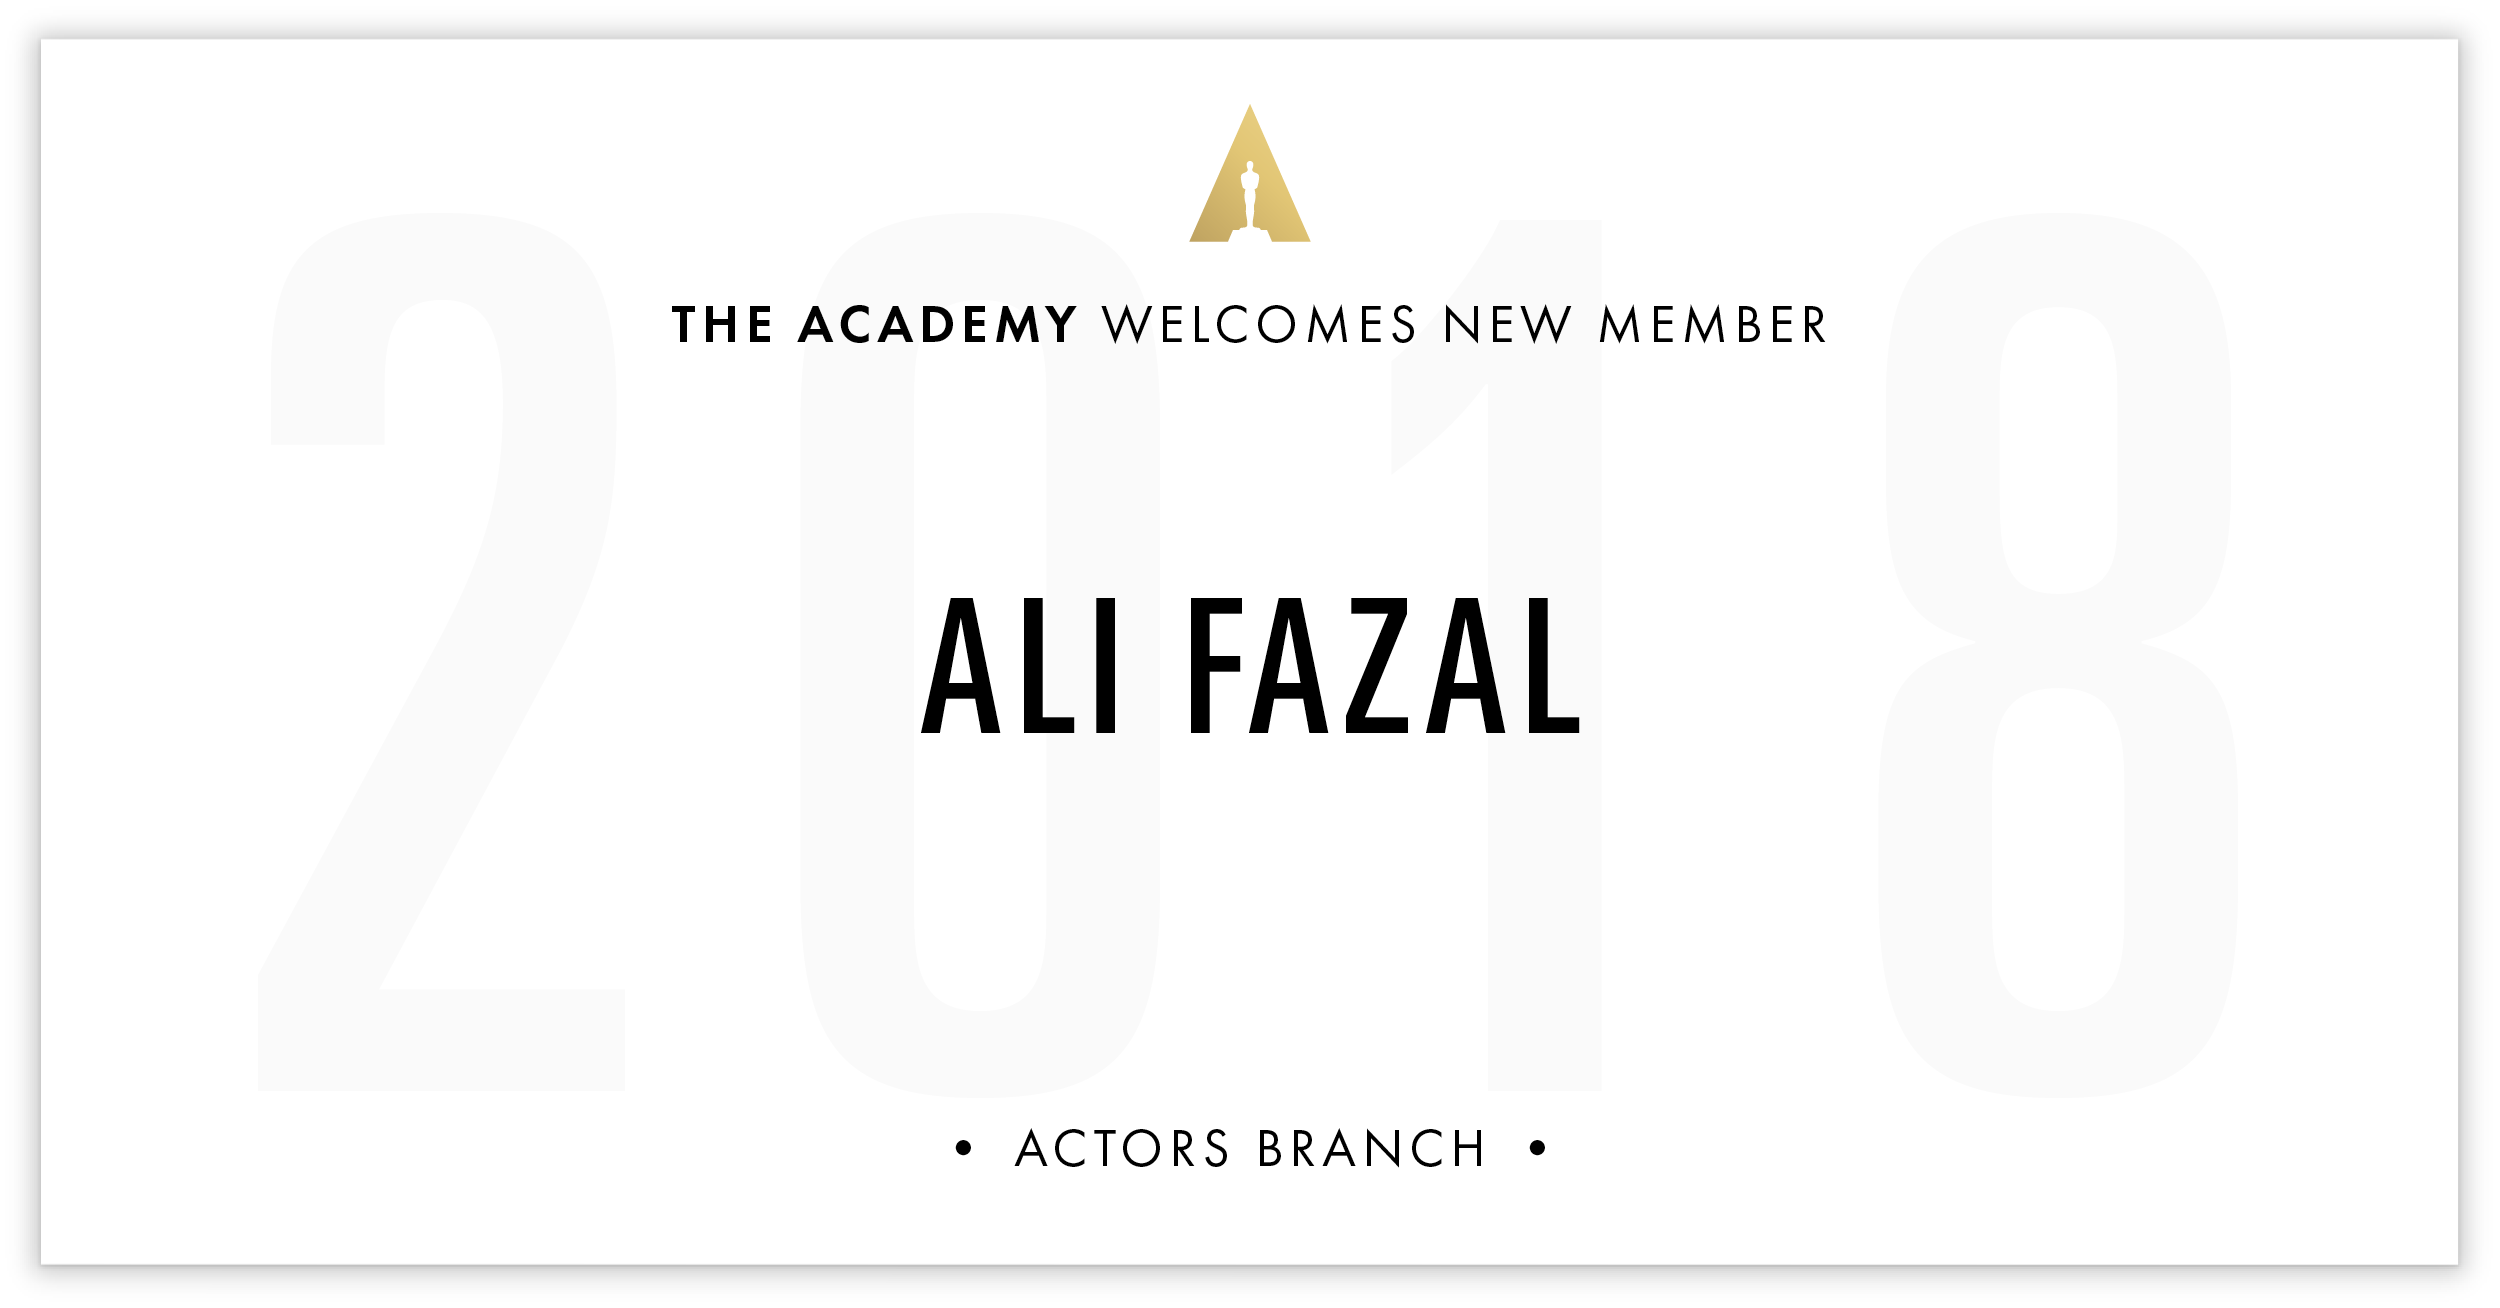 Ali Fazal is invited!